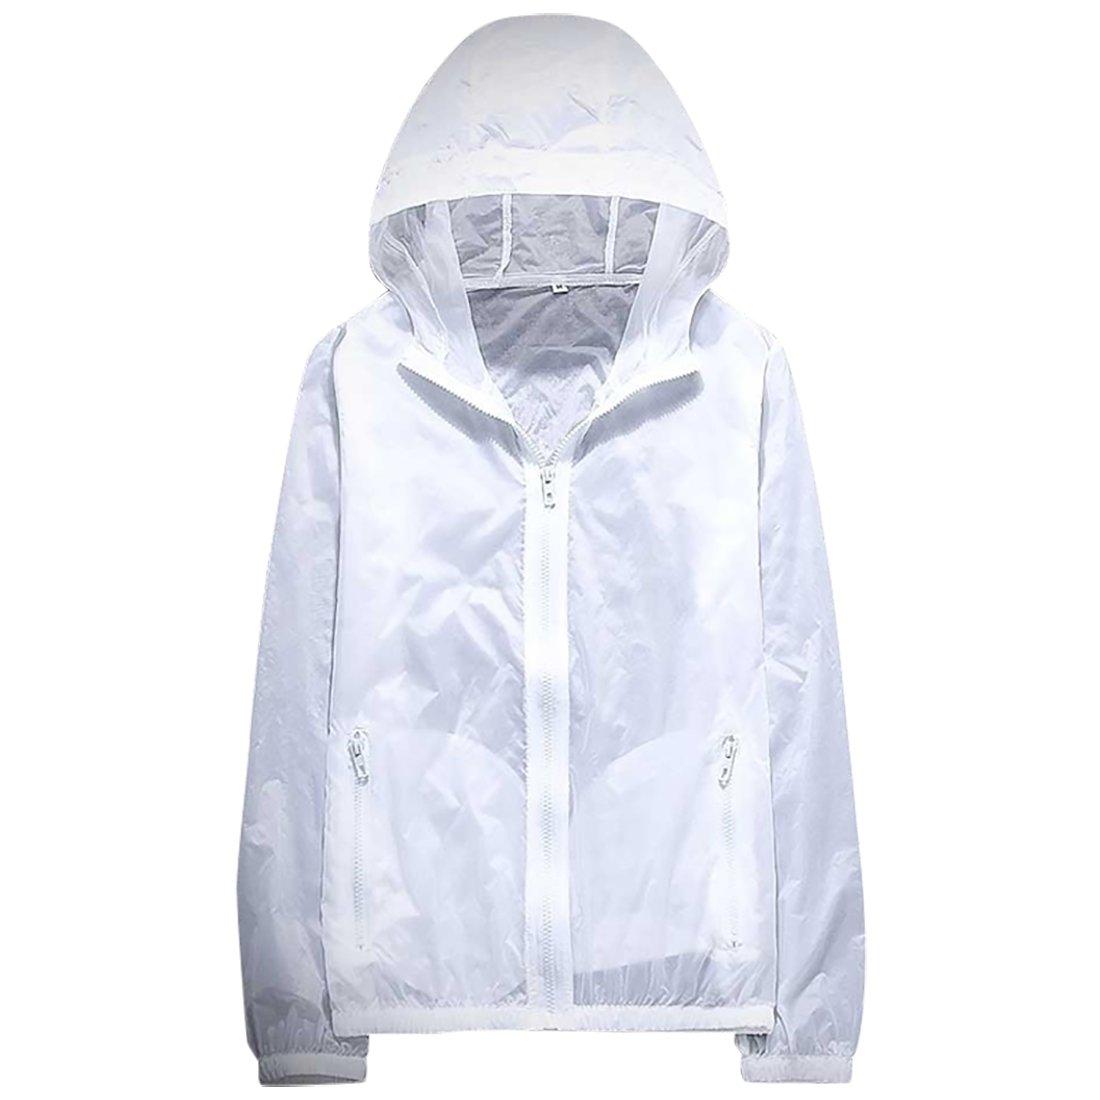 Panegy Unisex Sunscreen Hoodie Jacket Lightweight Drys Quickly Zipper Breathable Sunblock Suit Rain Coat White XX Large